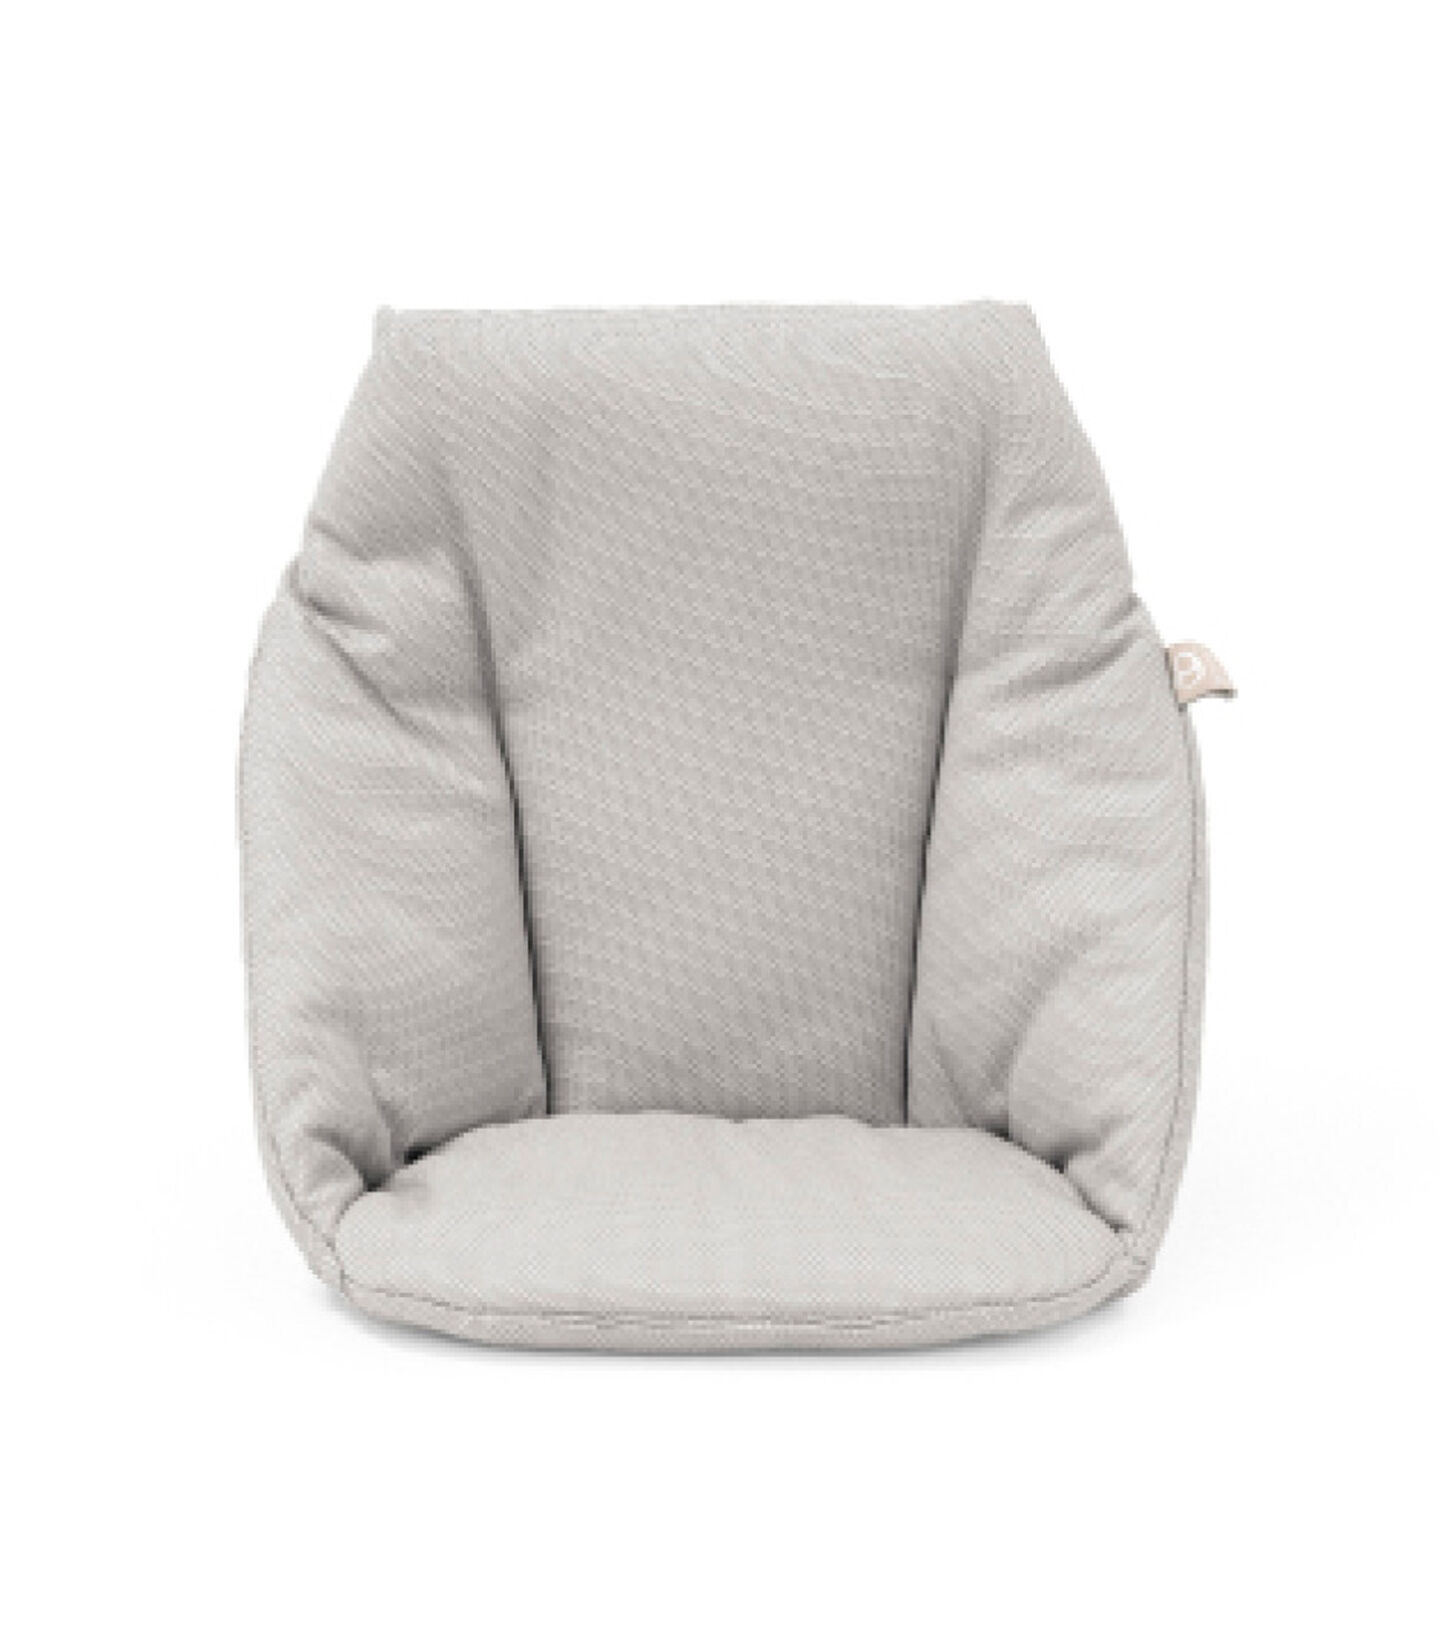 Tripp Trapp® Baby Cushion Timeless Grey.  view 2